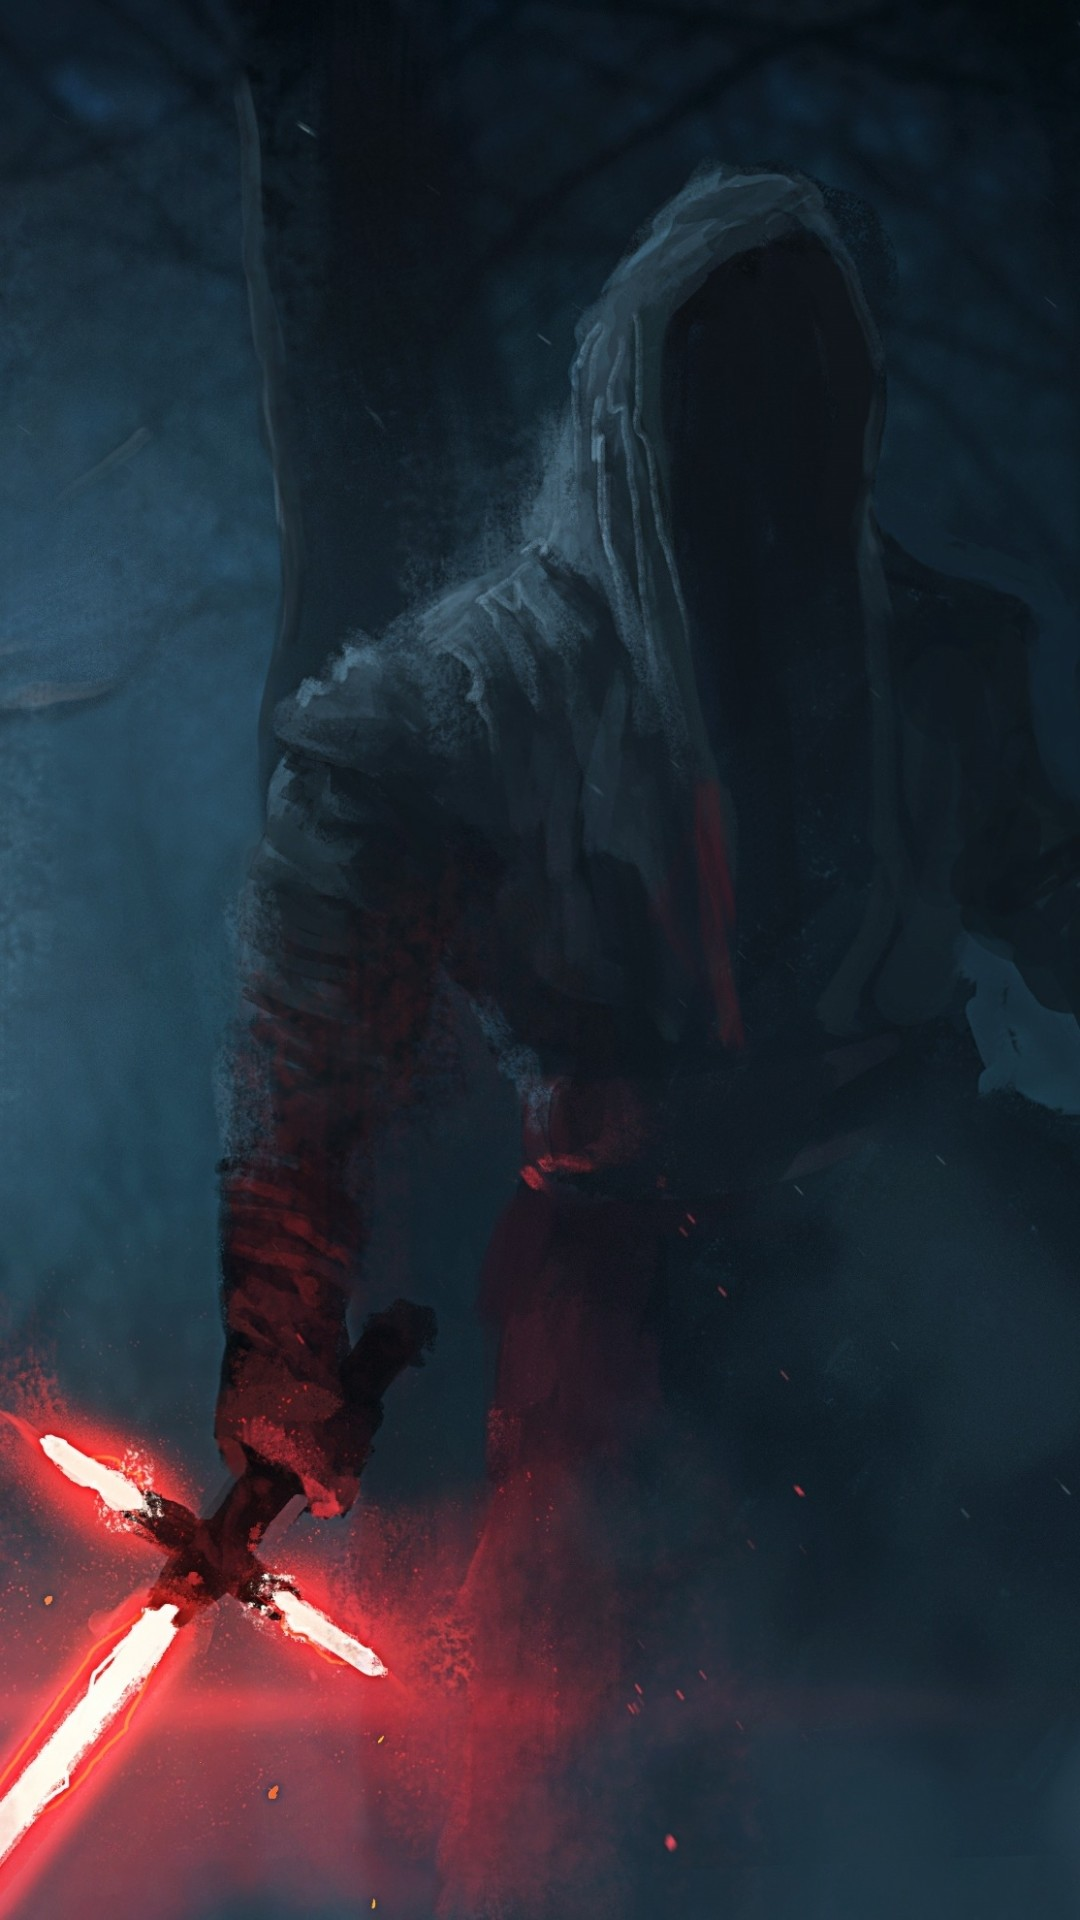 Star Wars The Force Awakens Wallpaper Kylo Ren painting